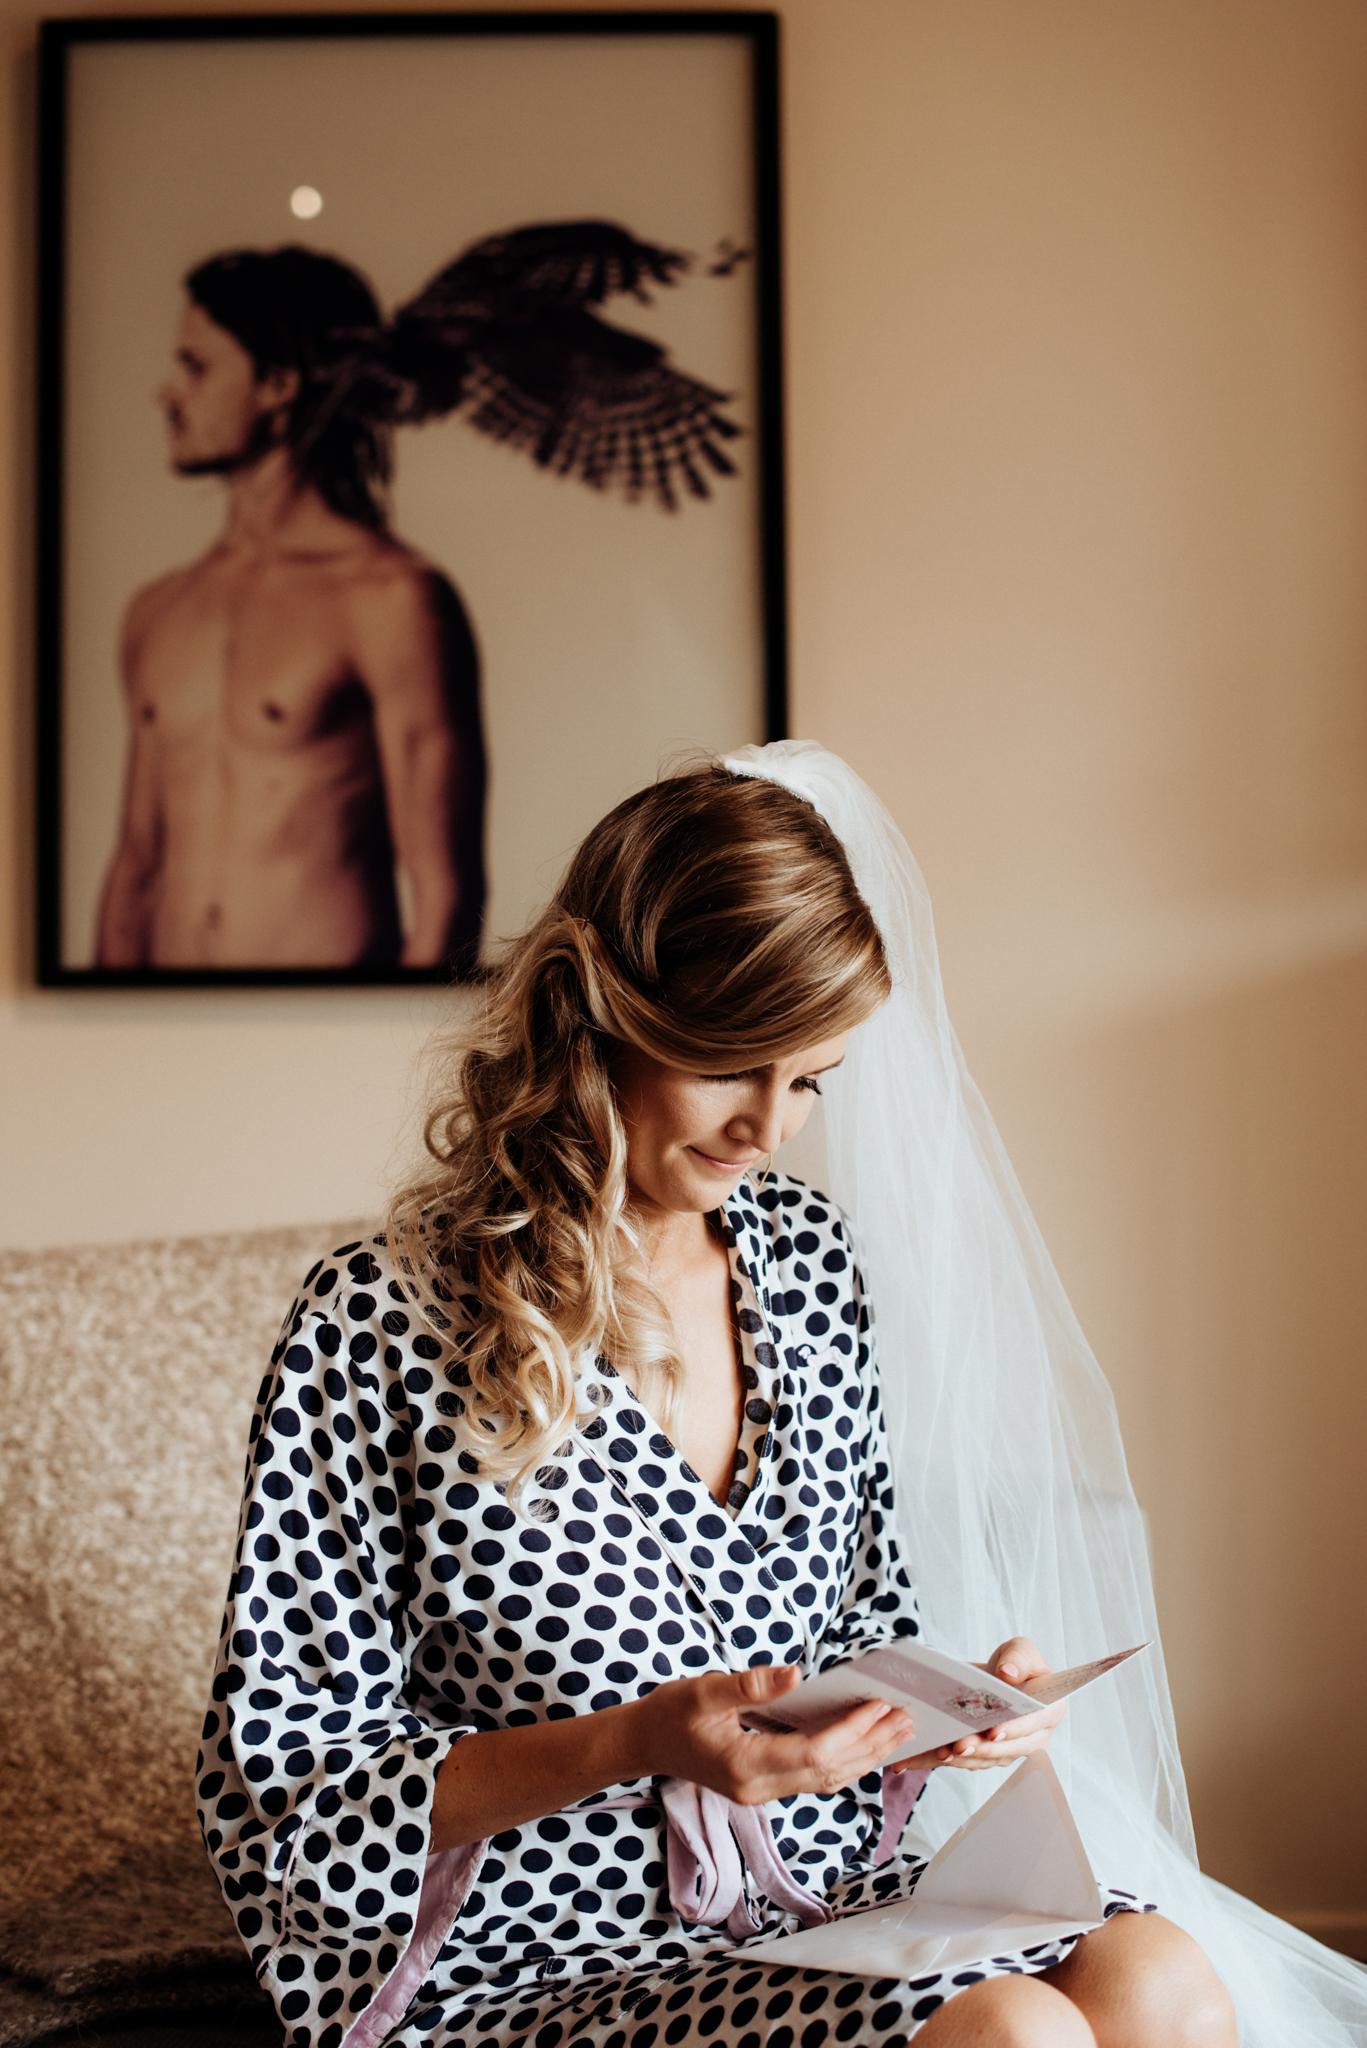 LOVELENSCAPES PHOTOGRAPHY • B+T • BYRON BAY WEDDING PHOTOGRAPHER • ALTITUDE 261 • 24.jpg